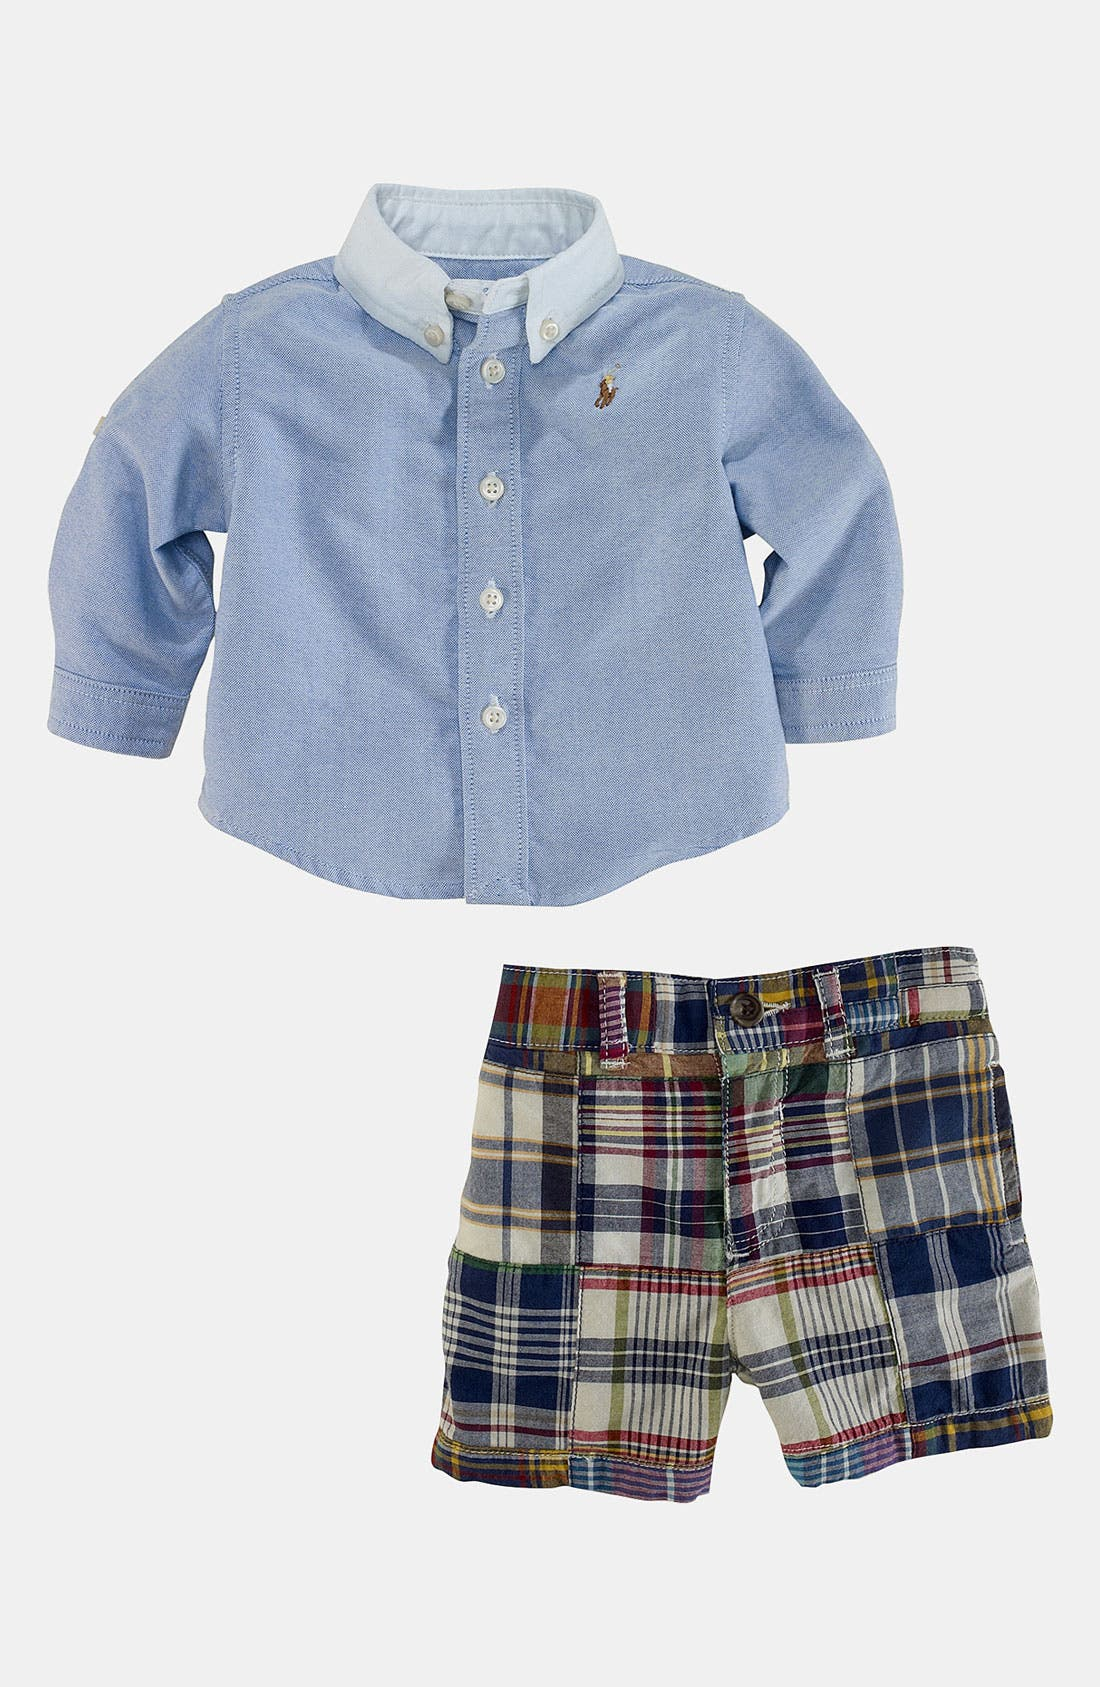 Alternate Image 1 Selected - Ralph Lauren Shirt & Shorts (Baby)